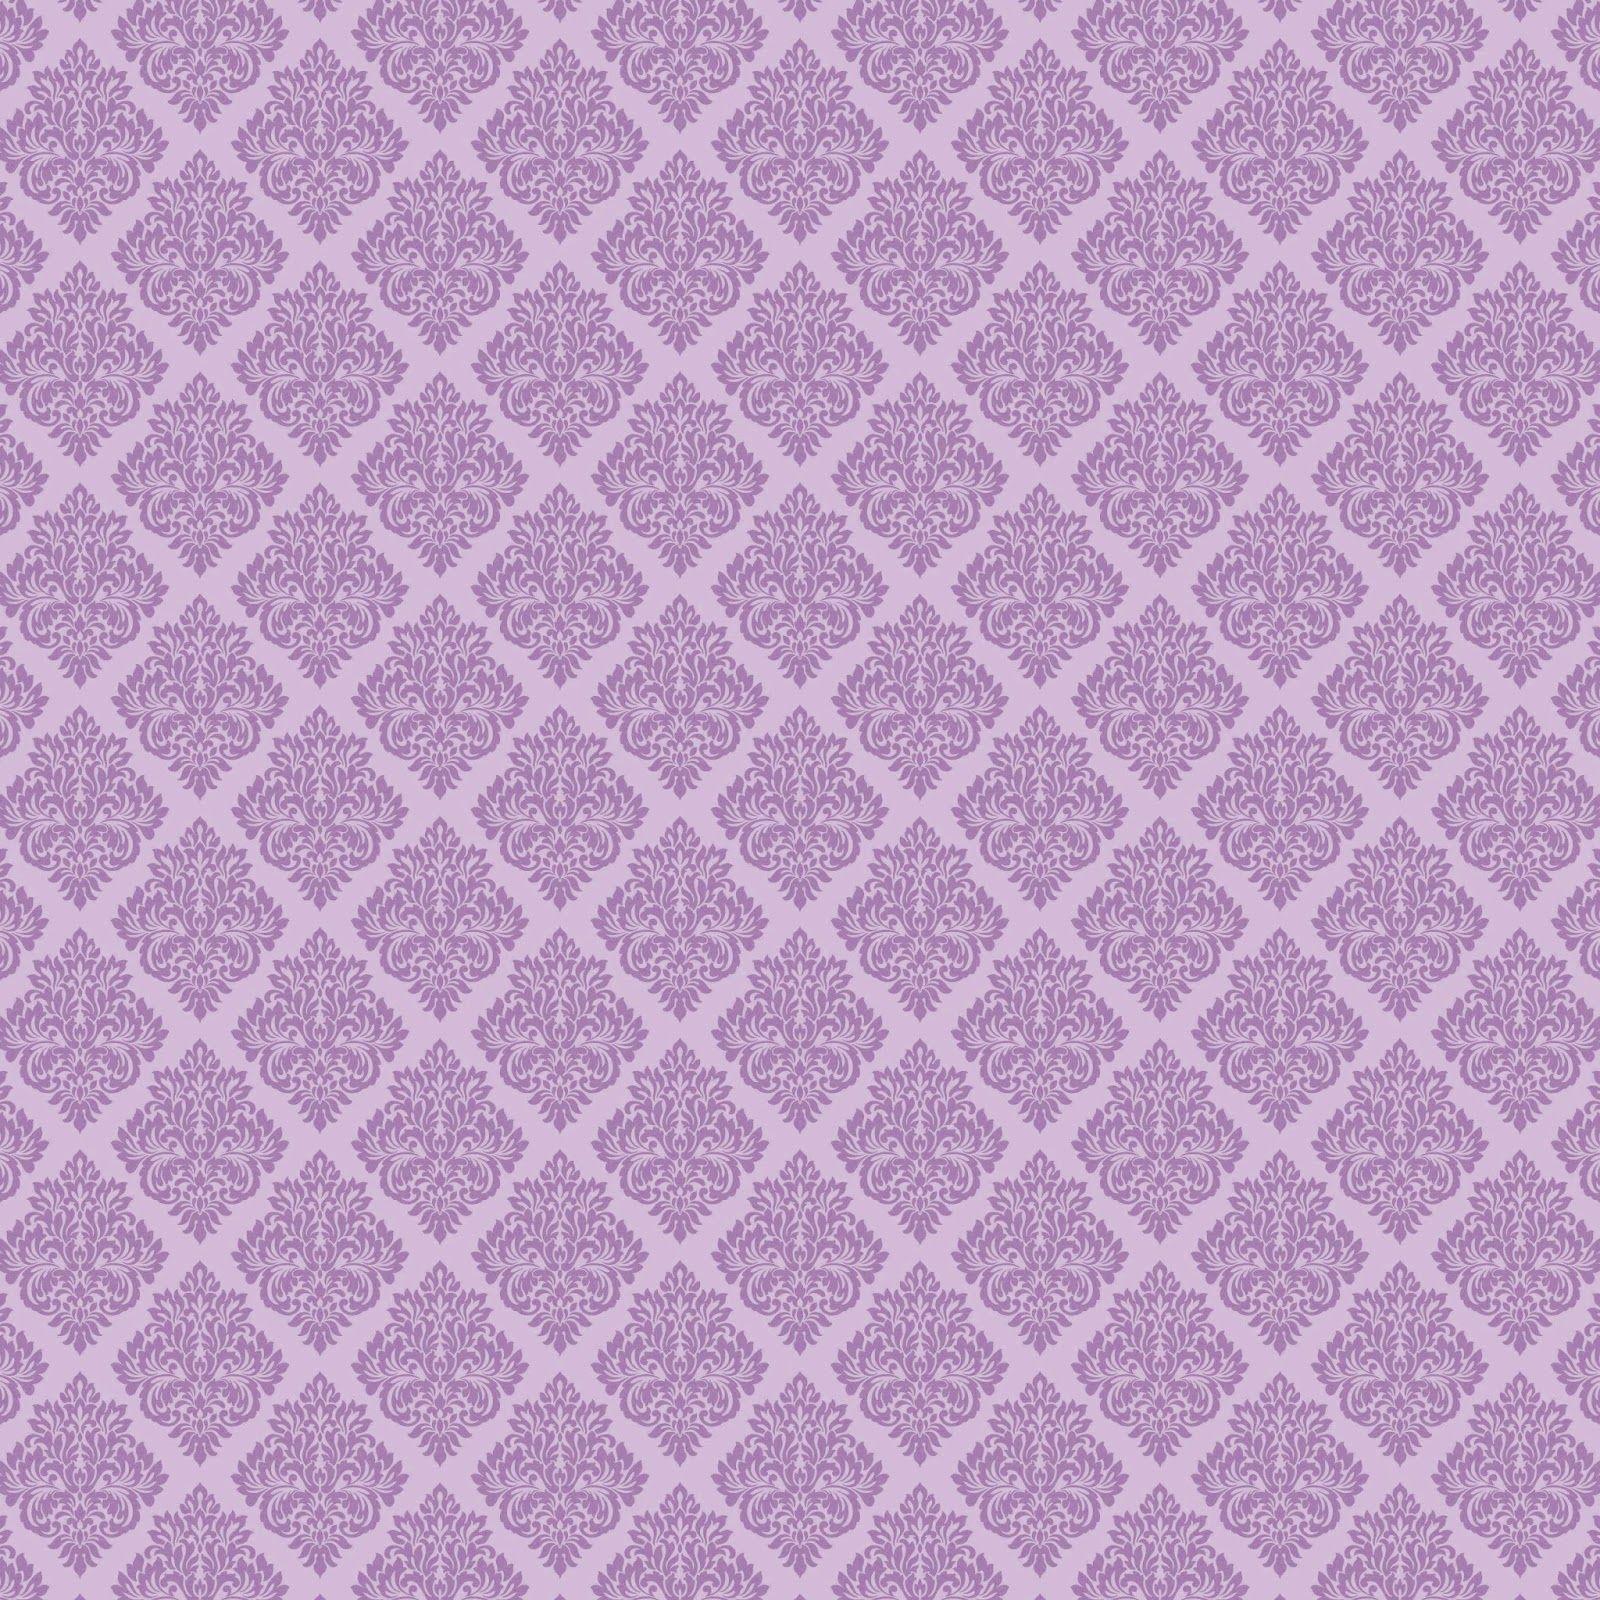 PAPIROLAS COLORIDAS  Papers - Purple and Mauve  Pinterest  Scrap, Patterns and Scrapbook paper